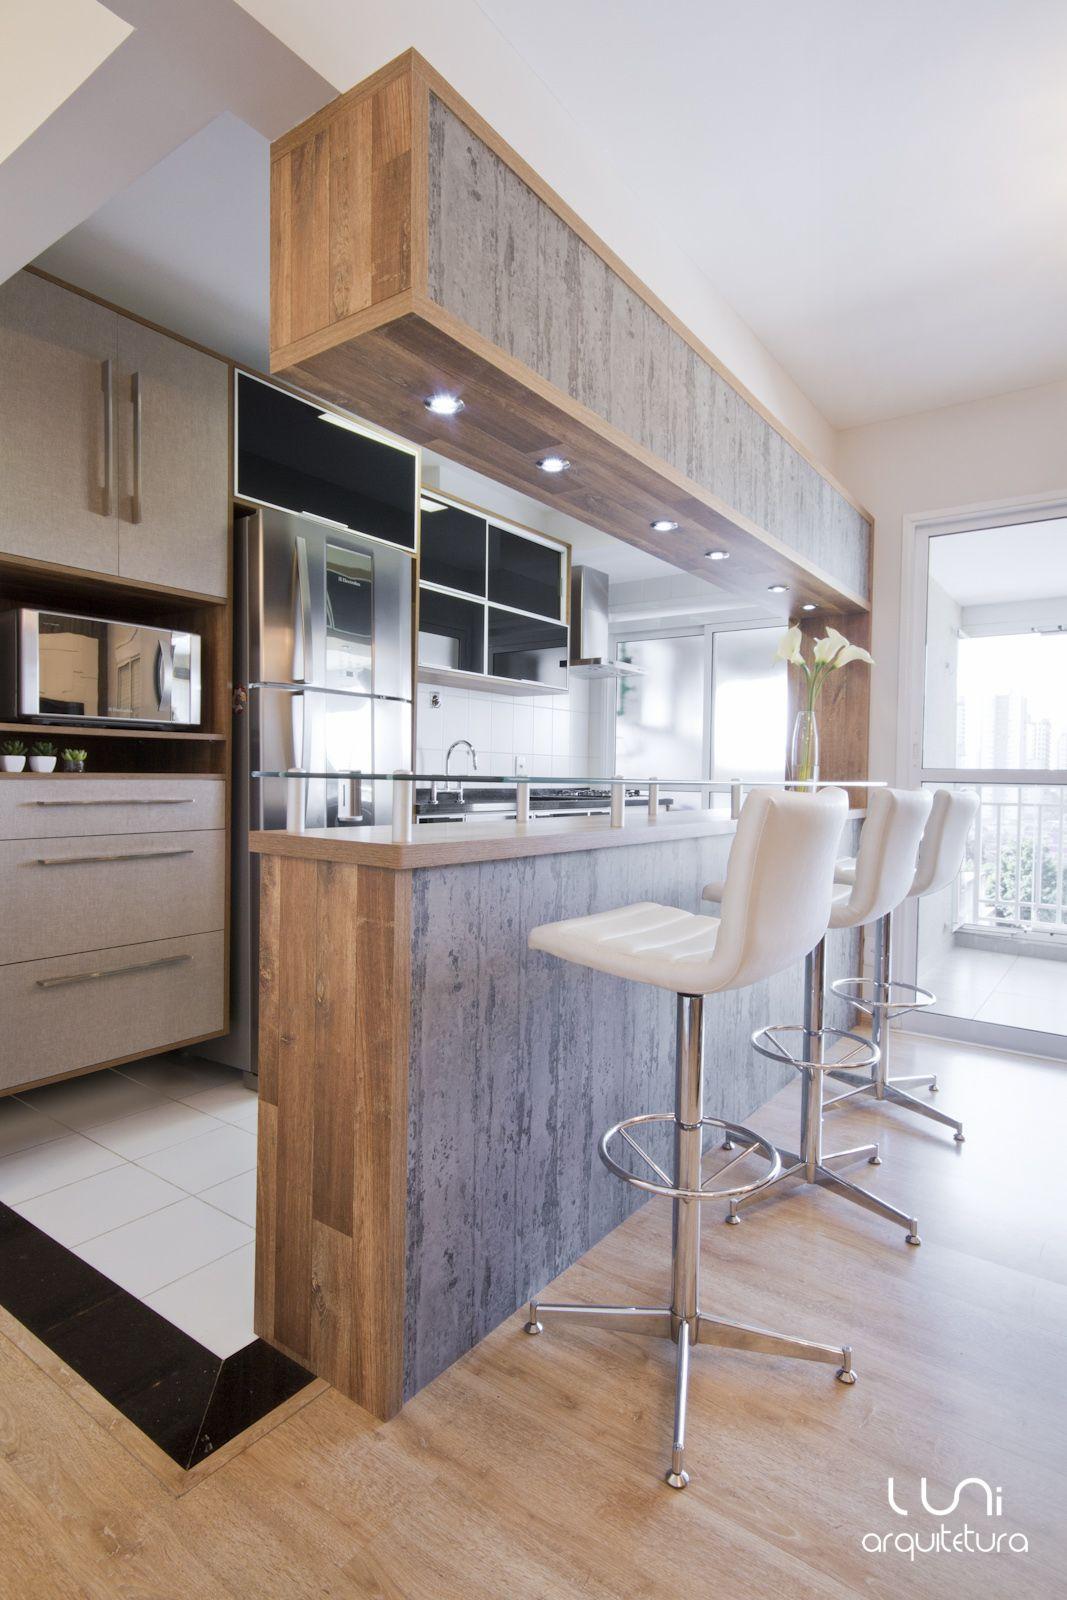 Cozinha Projeto Luni Arquitetura Kitchen By Luni Arquitetura Www